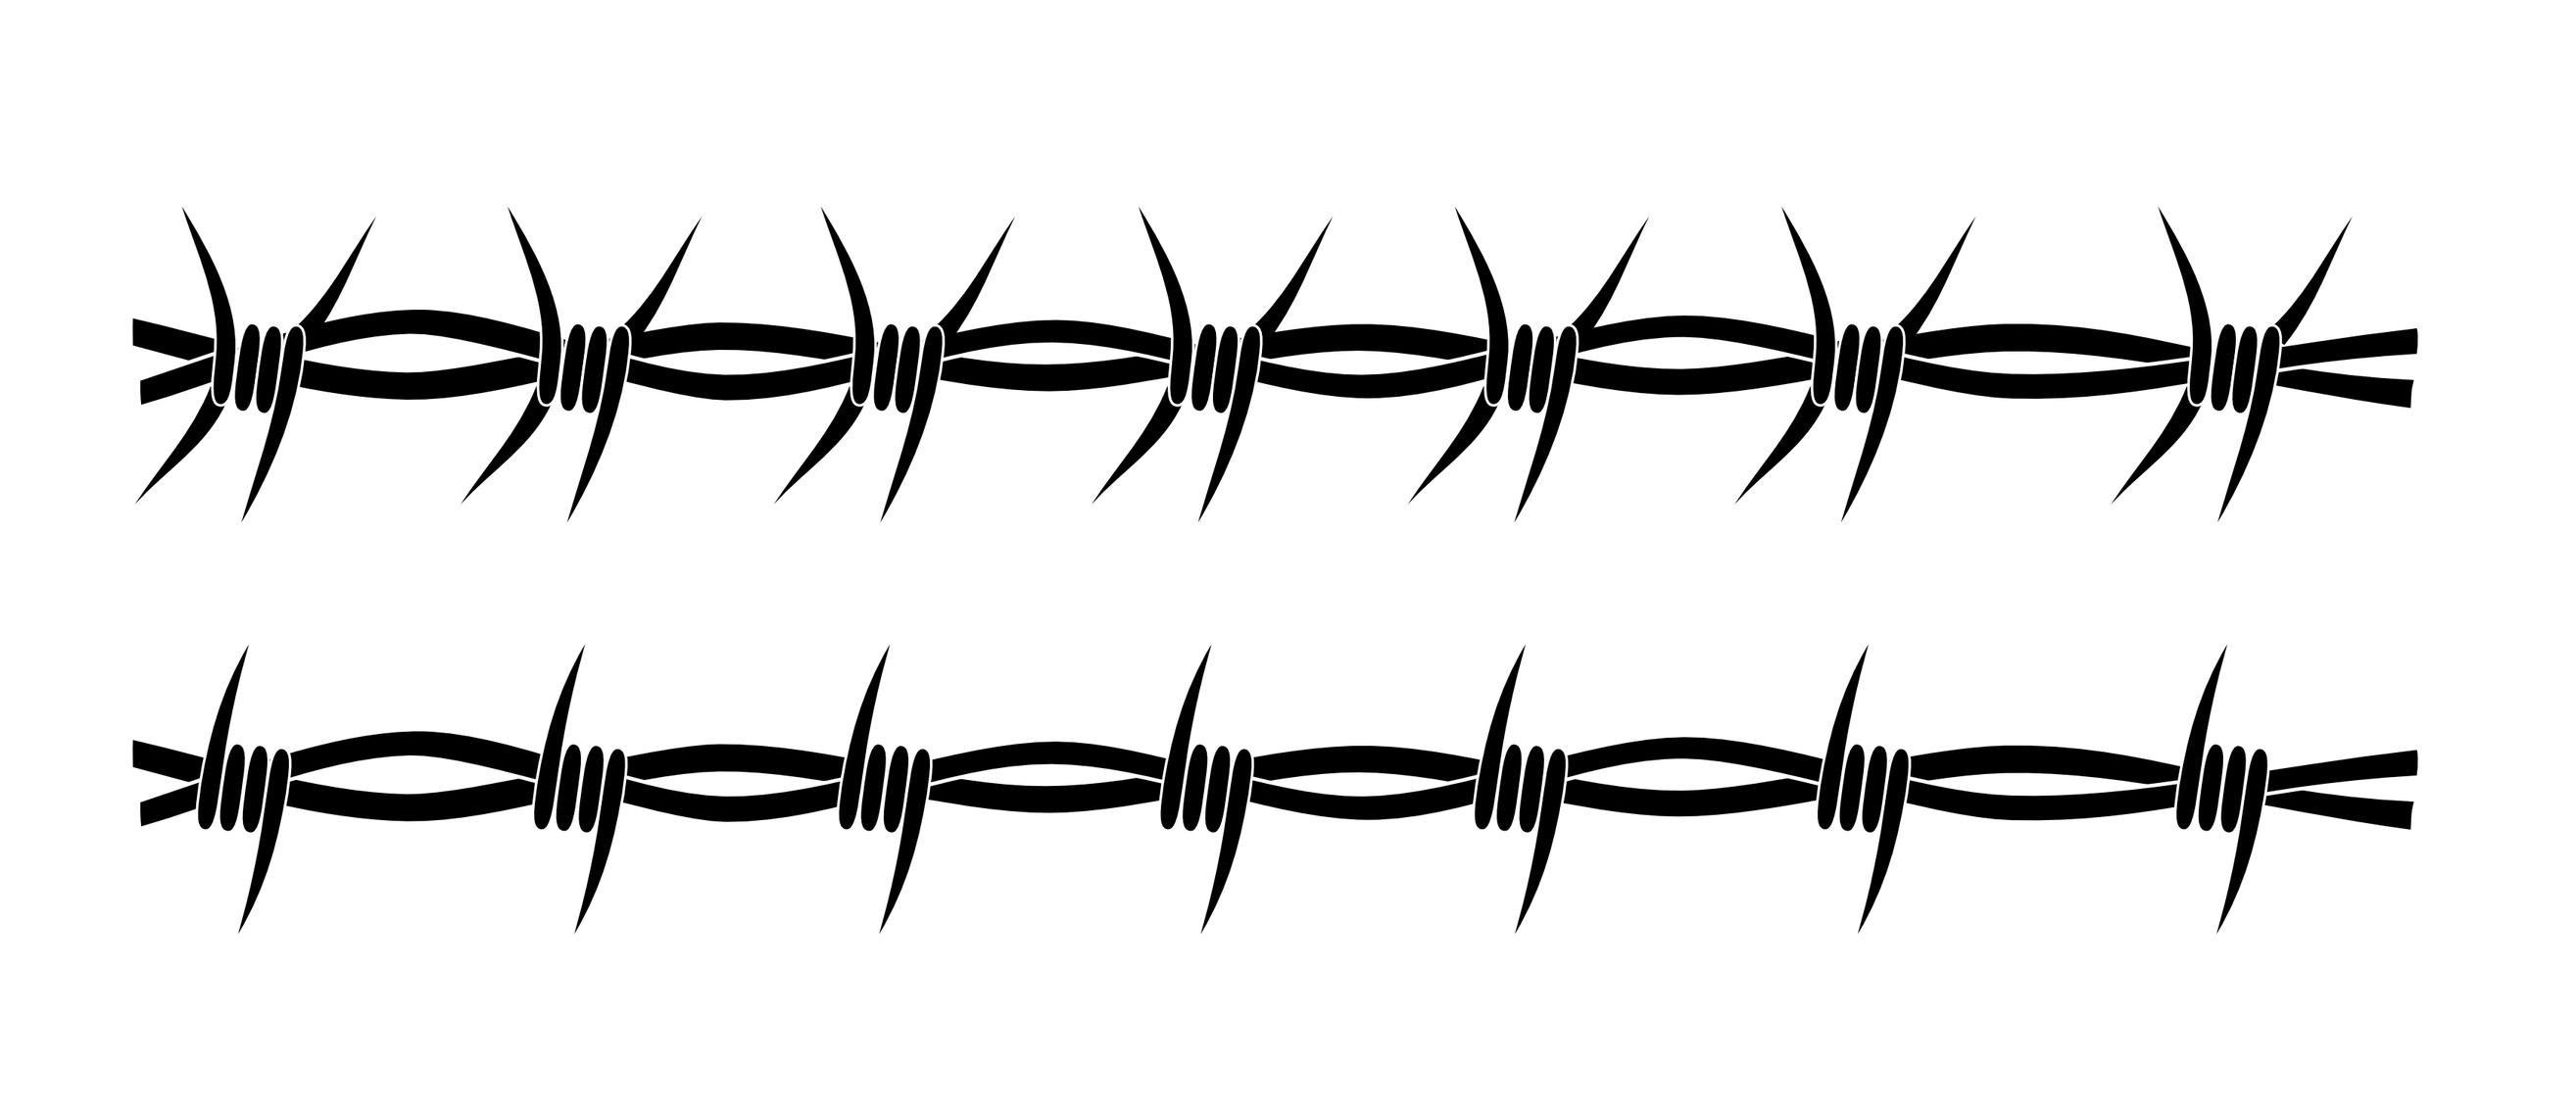 Free Stick Figure Family, Download Free Clip Art, Free